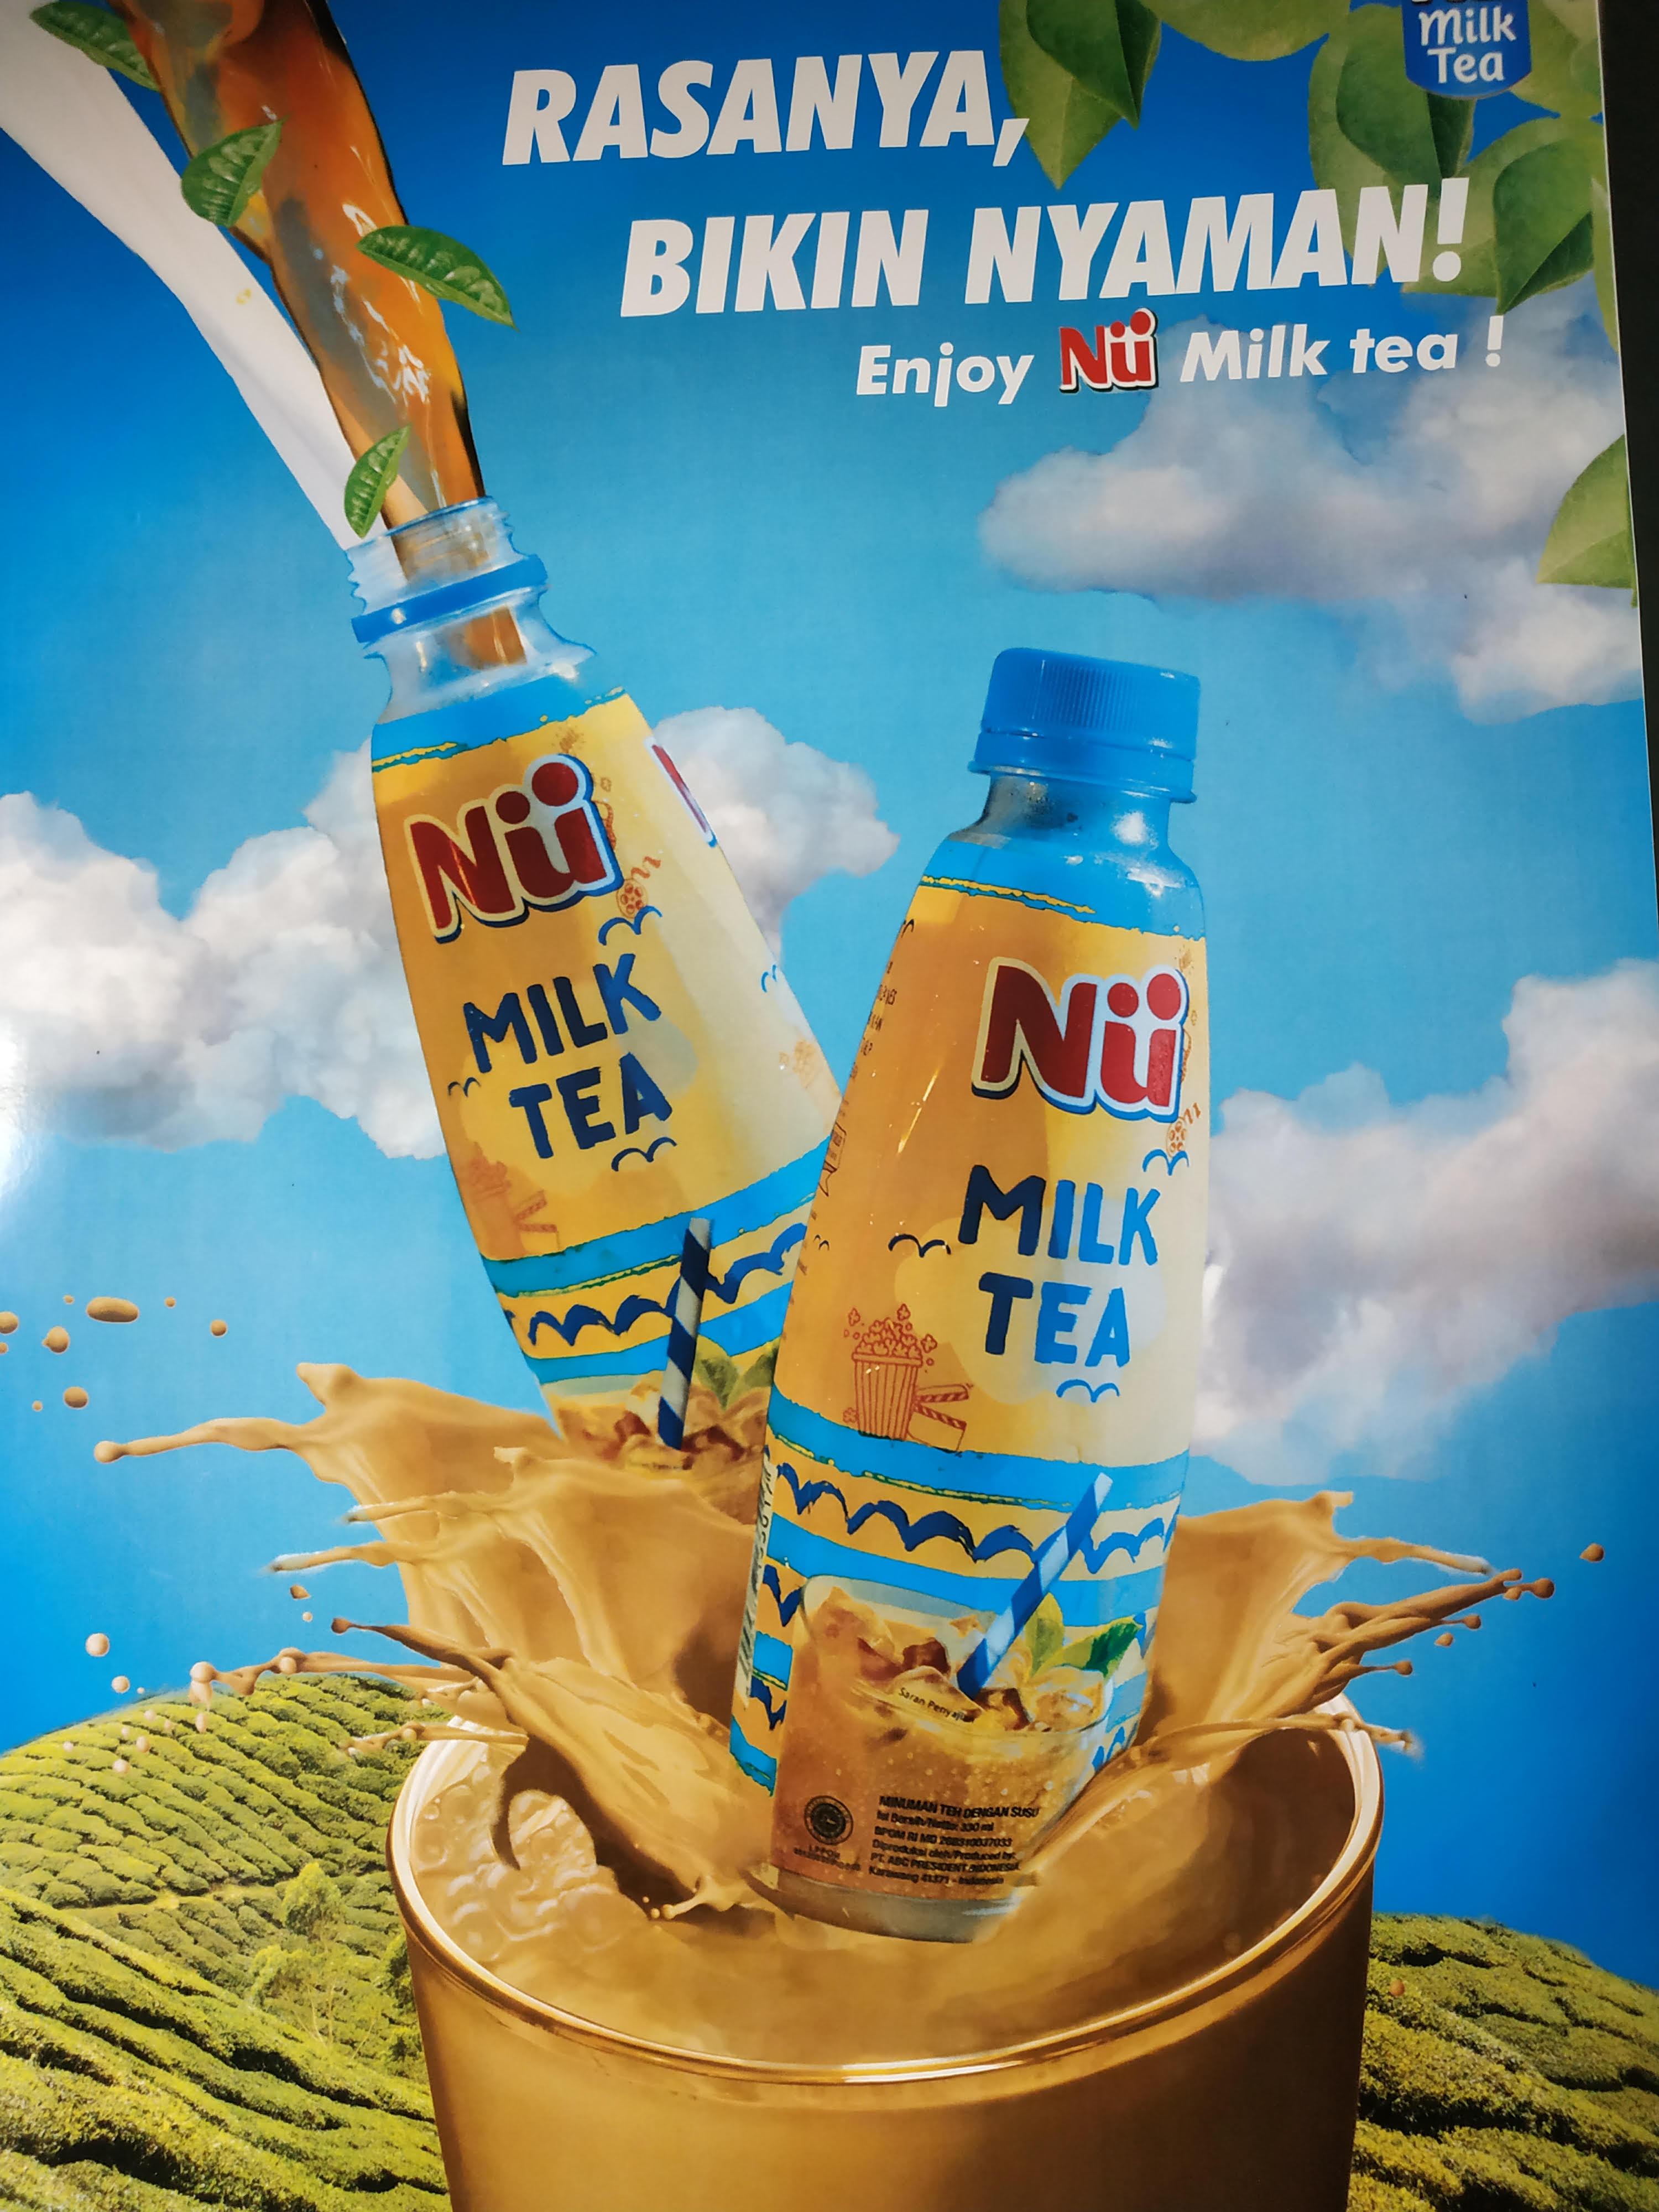 Materi Pelajaran 8 Contoh Gambar Iklan Produk Minuman